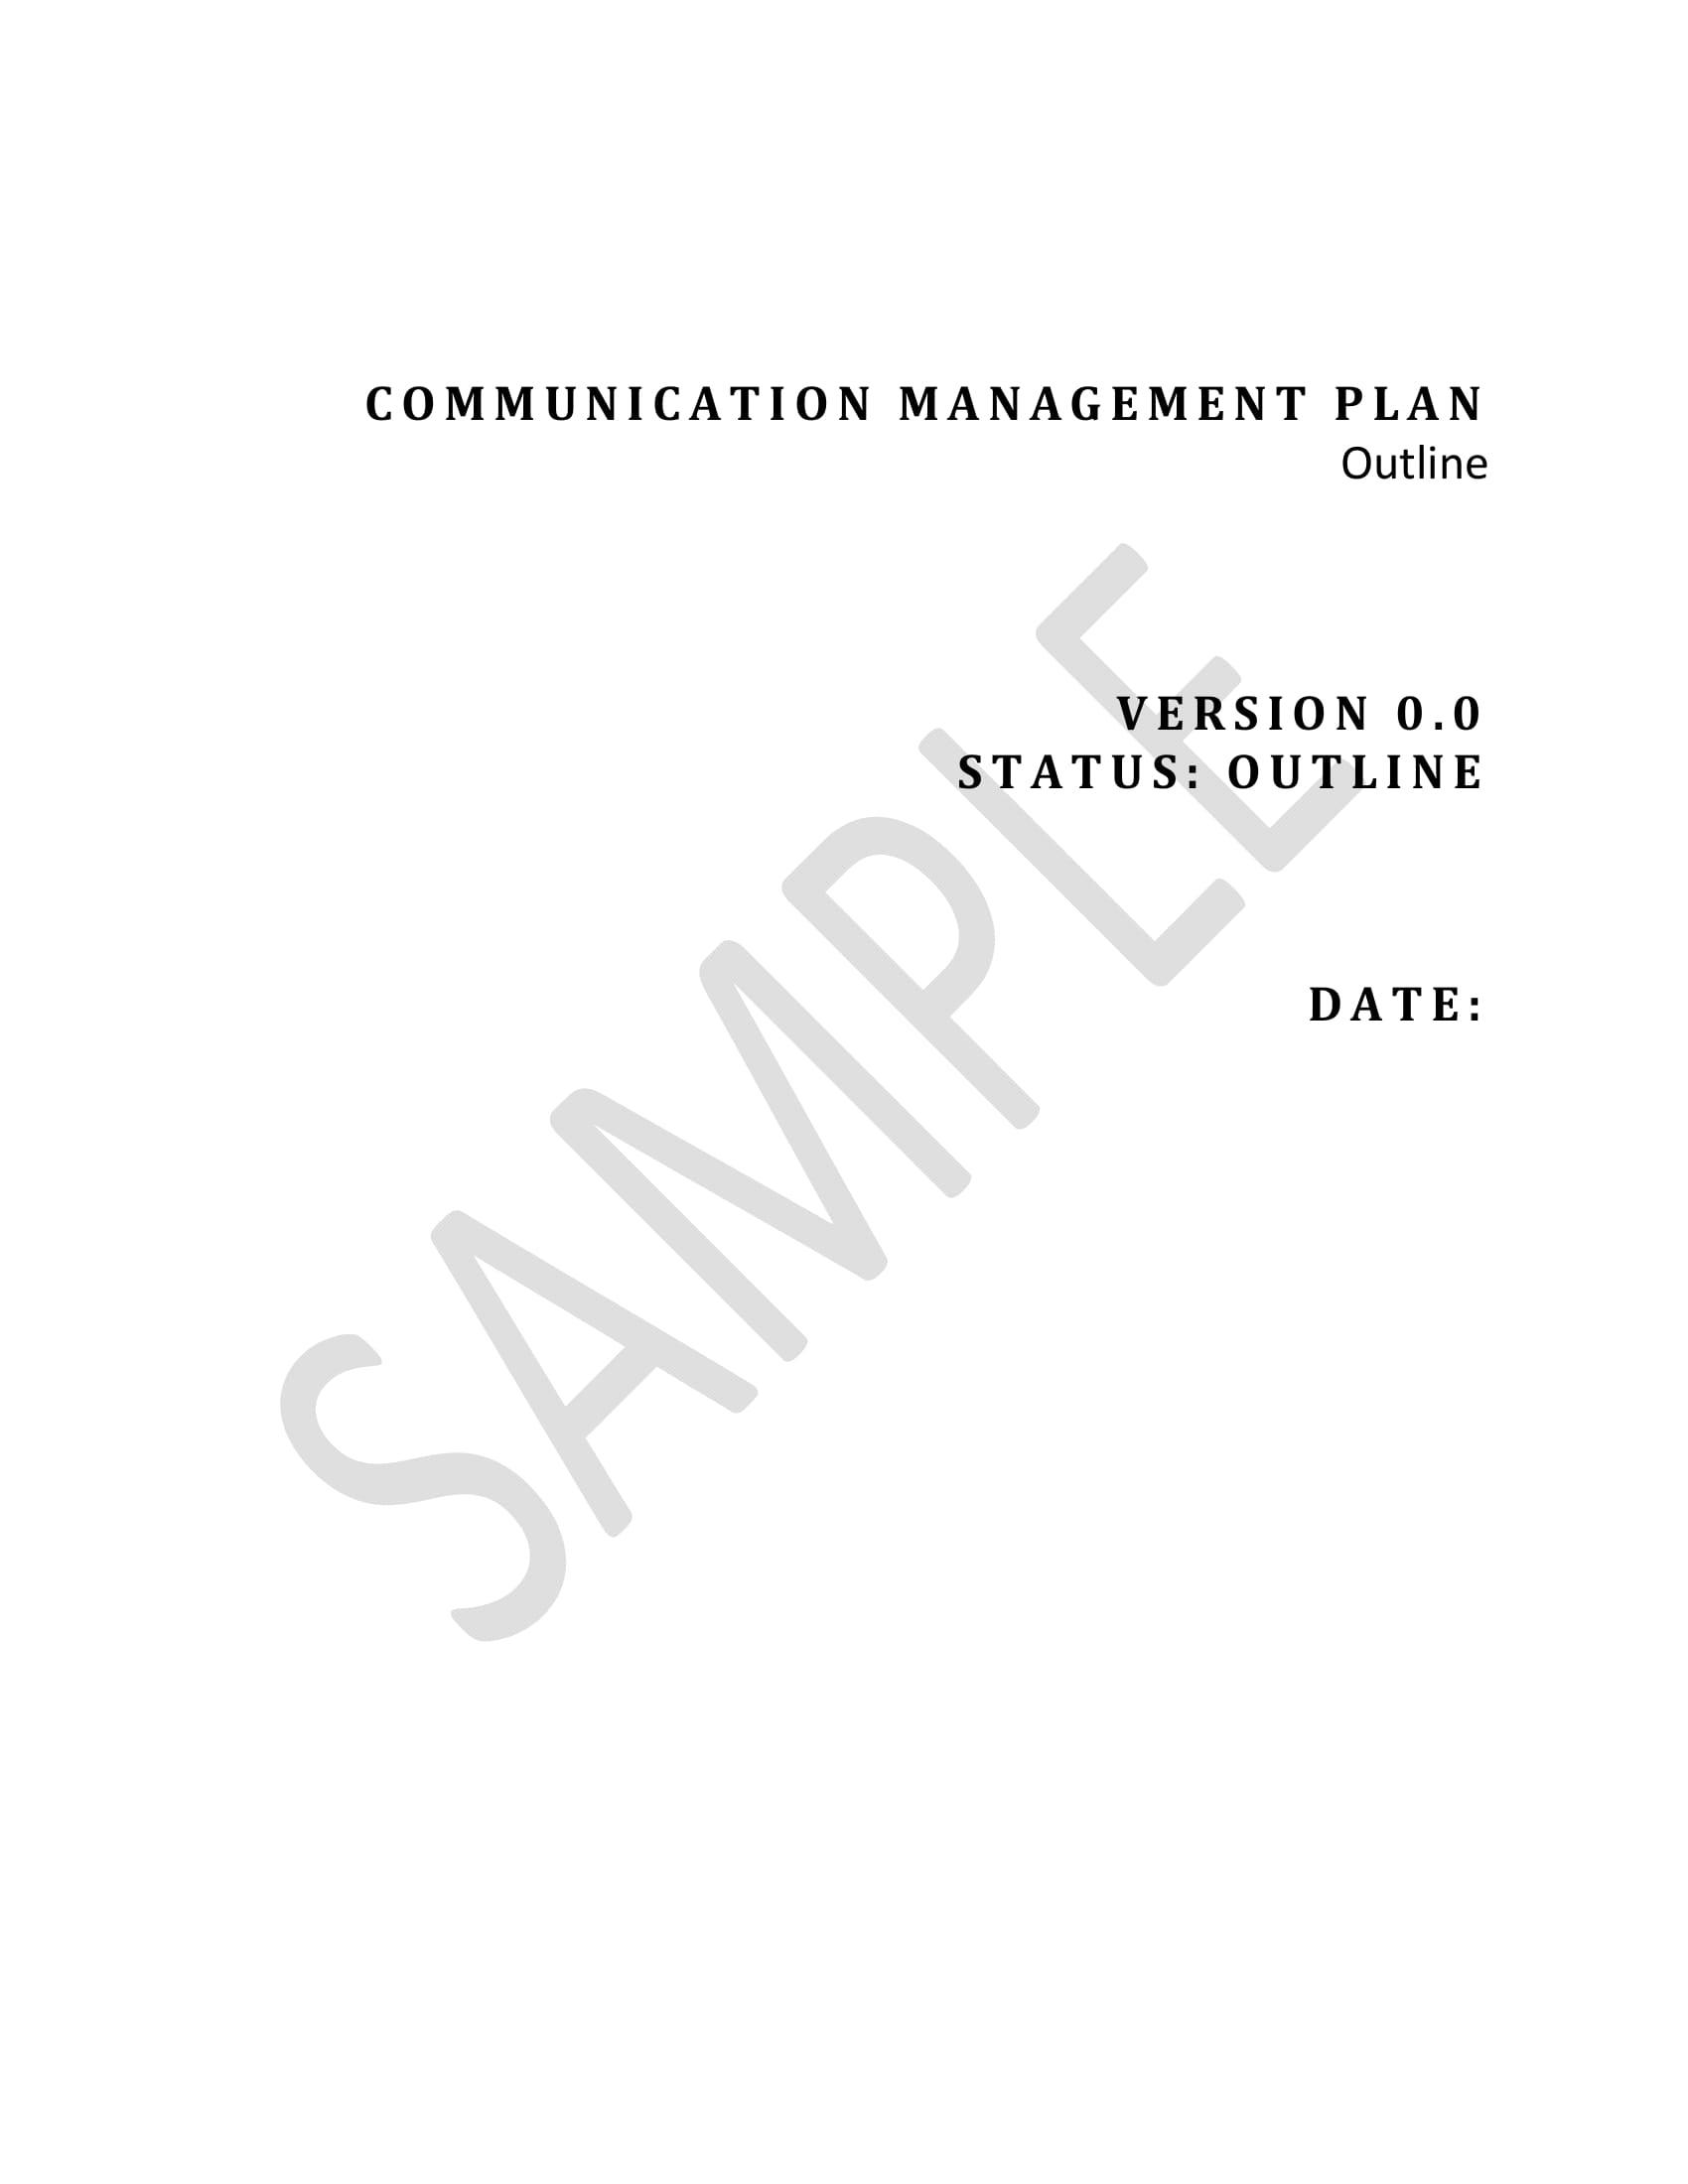 detailed communication management plan example